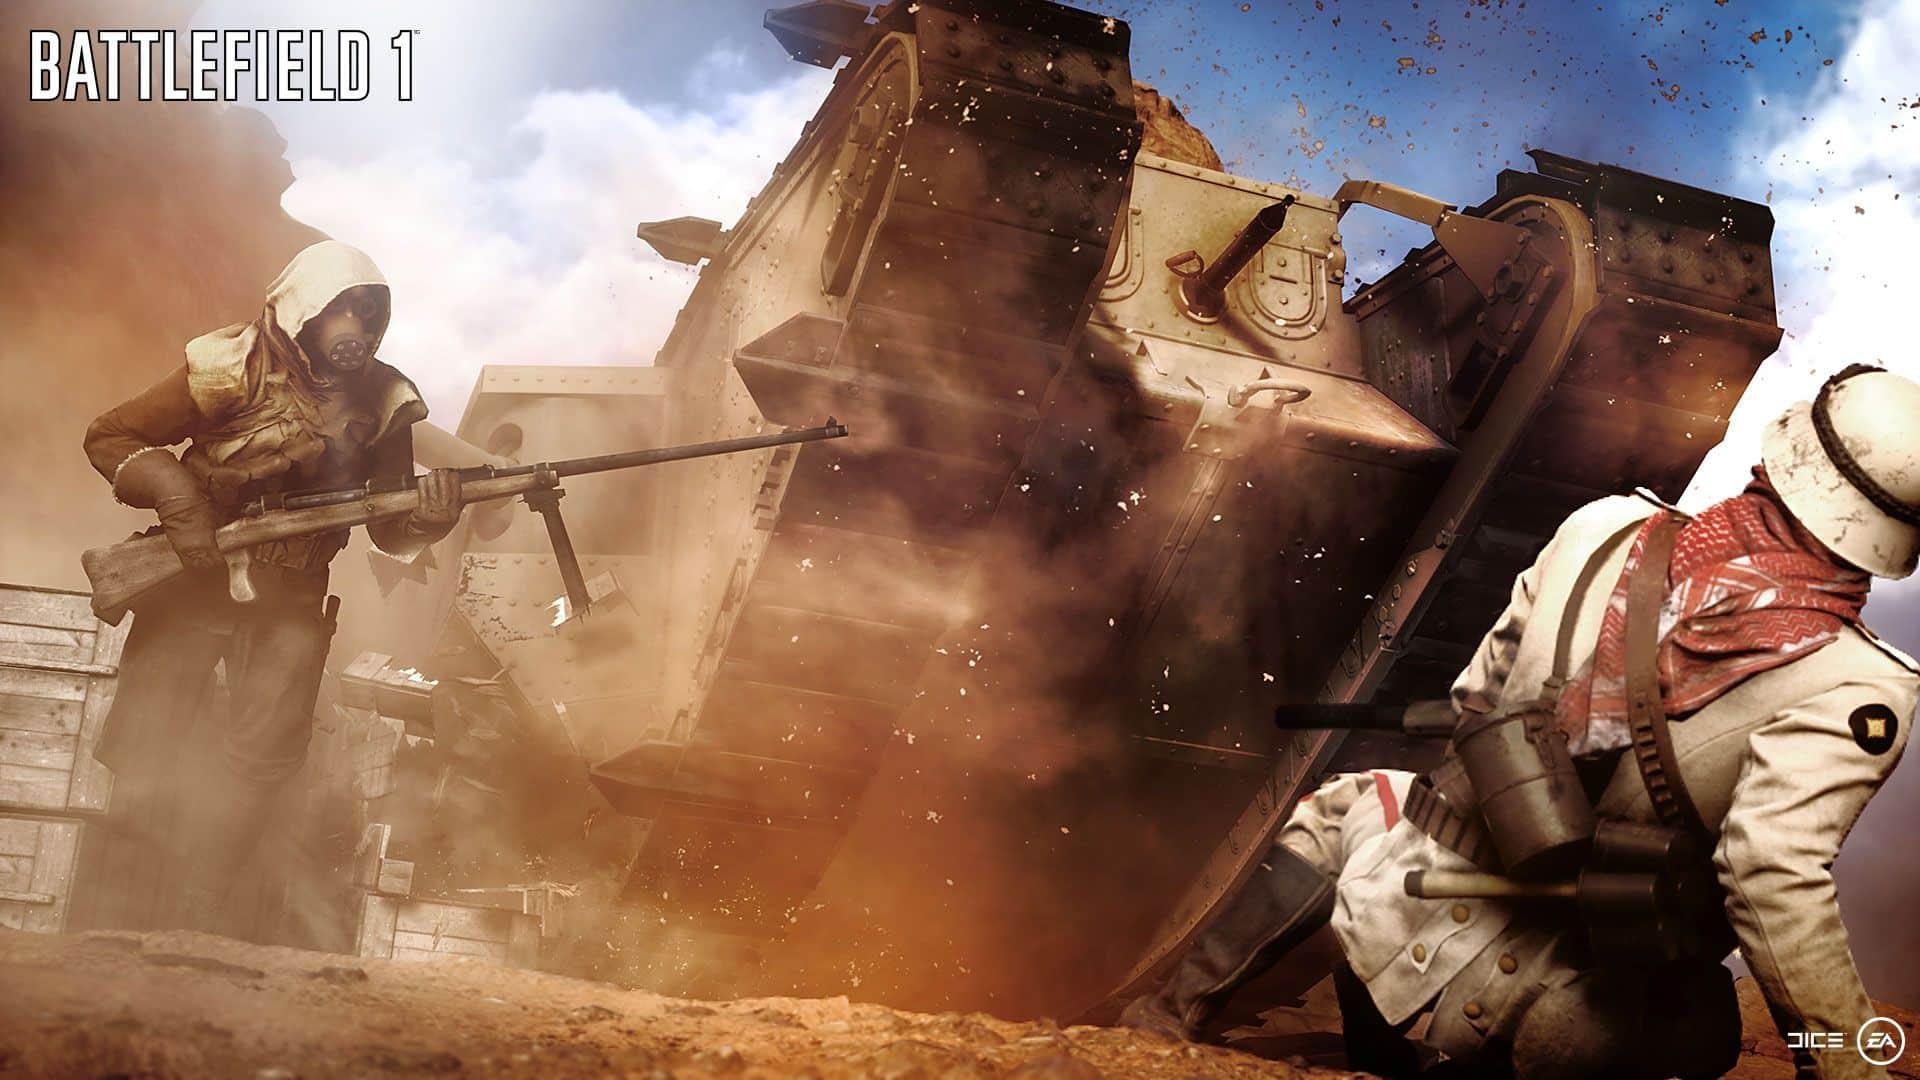 Battlefield 1 avrà una Open Beta